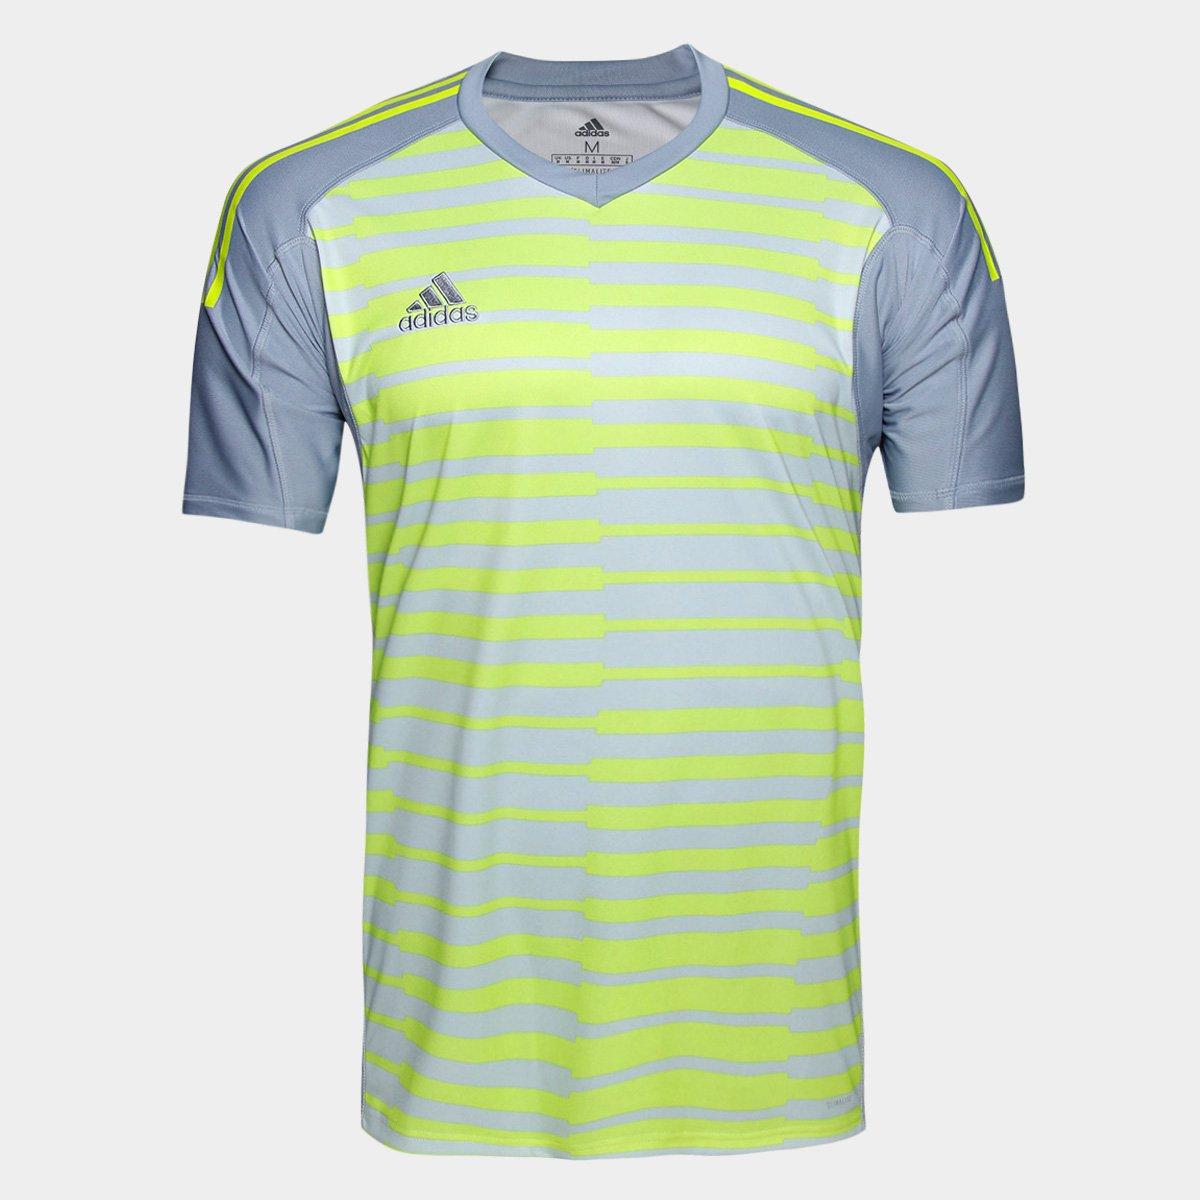 Camisa Adidas Goleiro Adipro 18 Masculina - Cinza e Amarelo - Compre ... a89d5b5ceb23b